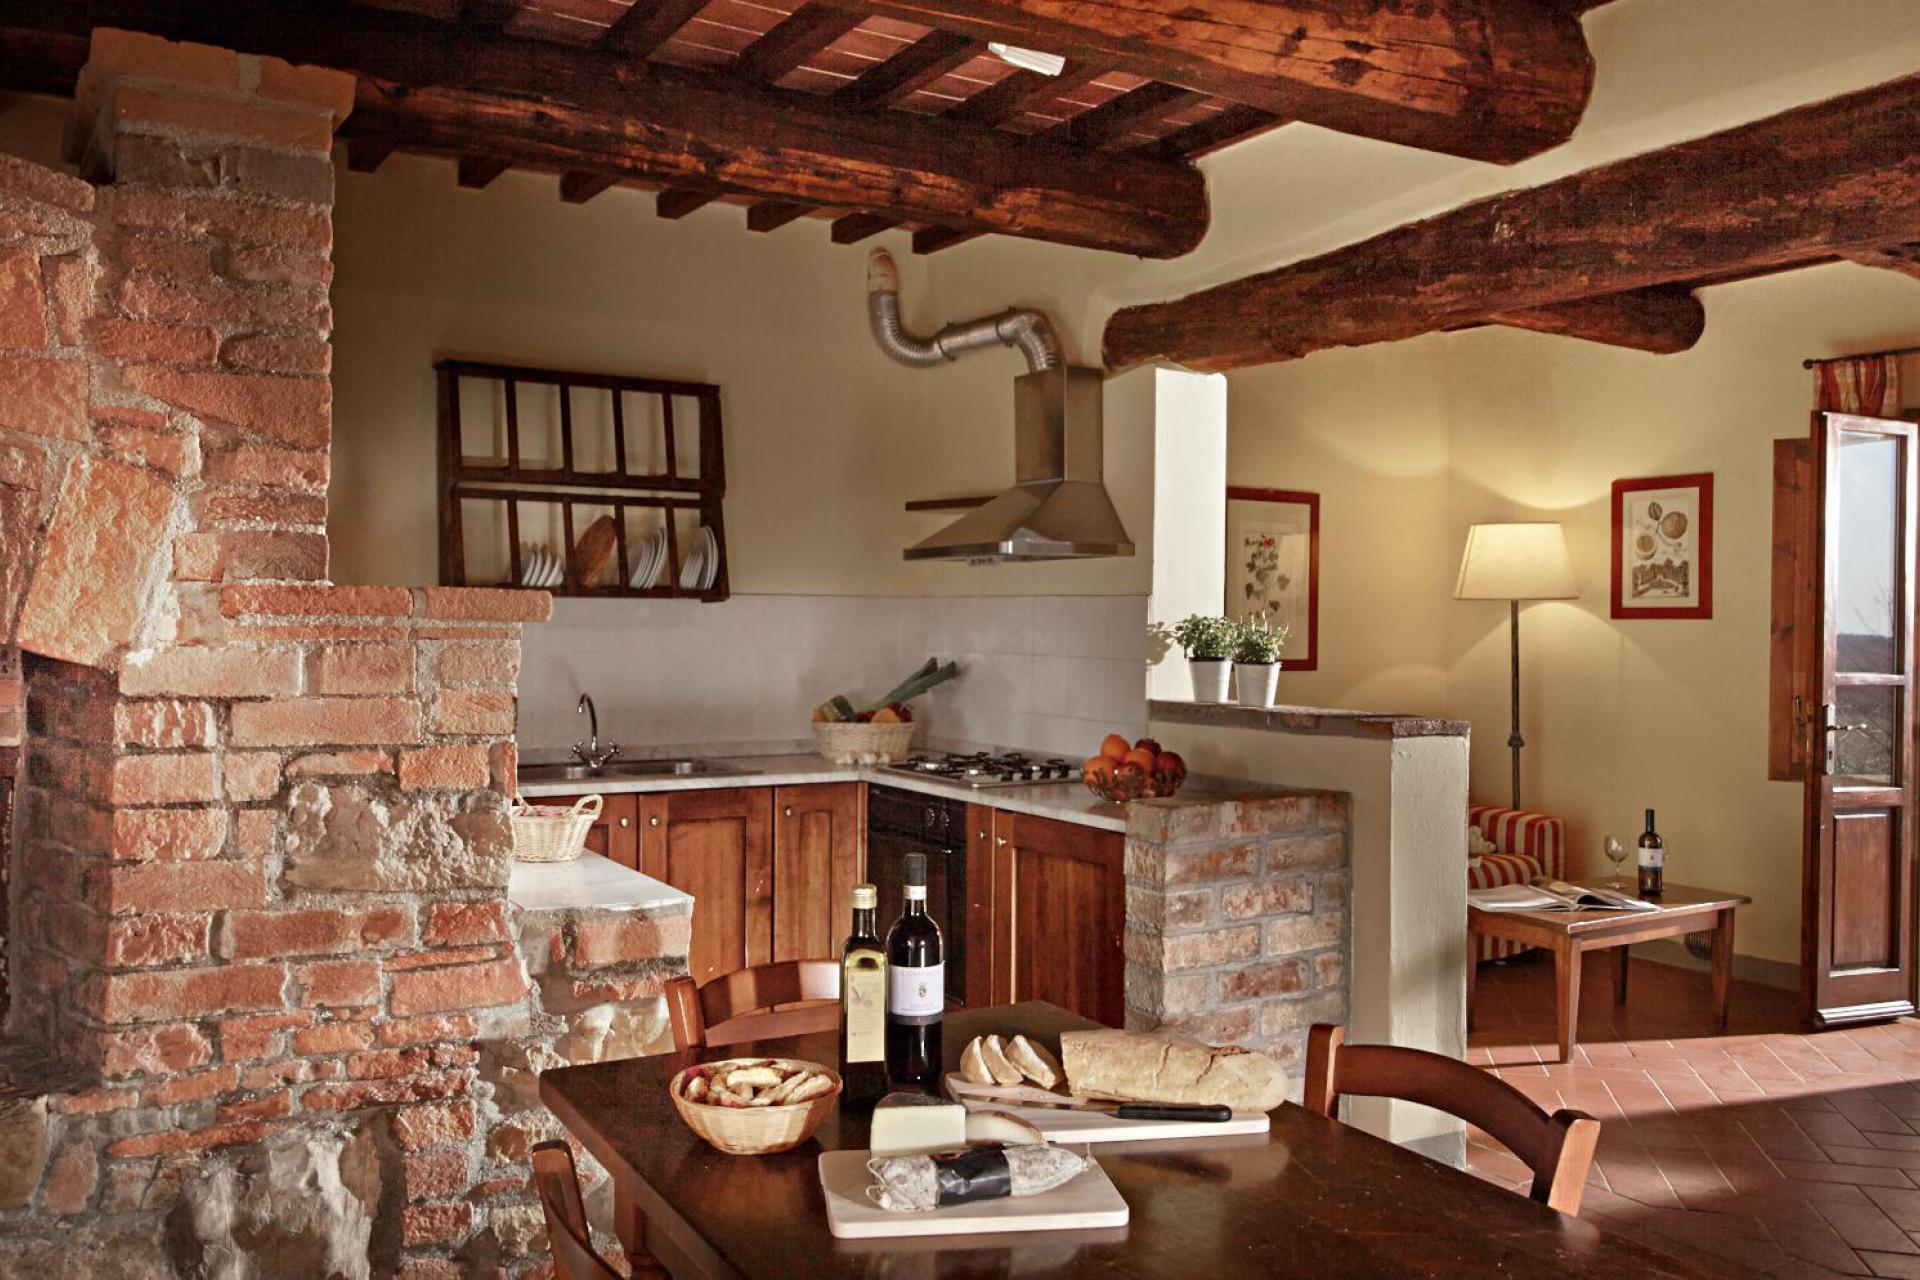 Agriturismo Toskana Wunderschönes Landhaus in der Toskana mit Meerblick